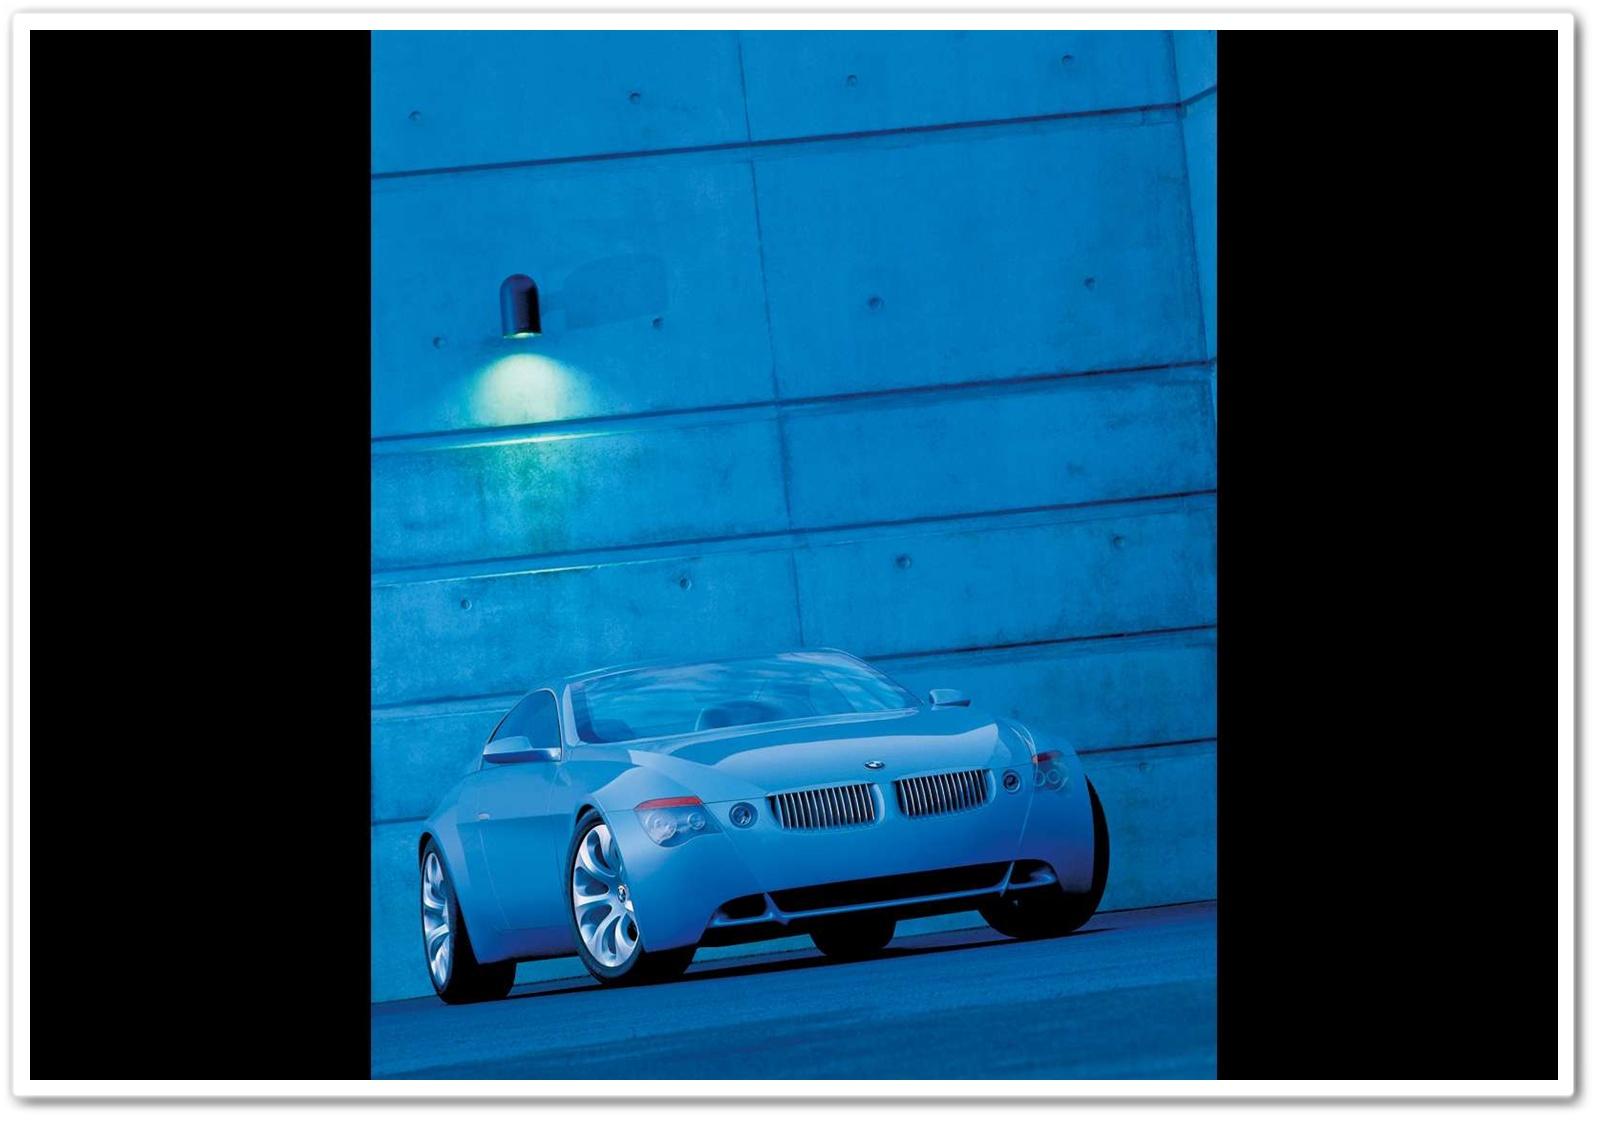 Bmw Z9 Gran Turismo Concept (50 Images) - HD Car Wallpaper